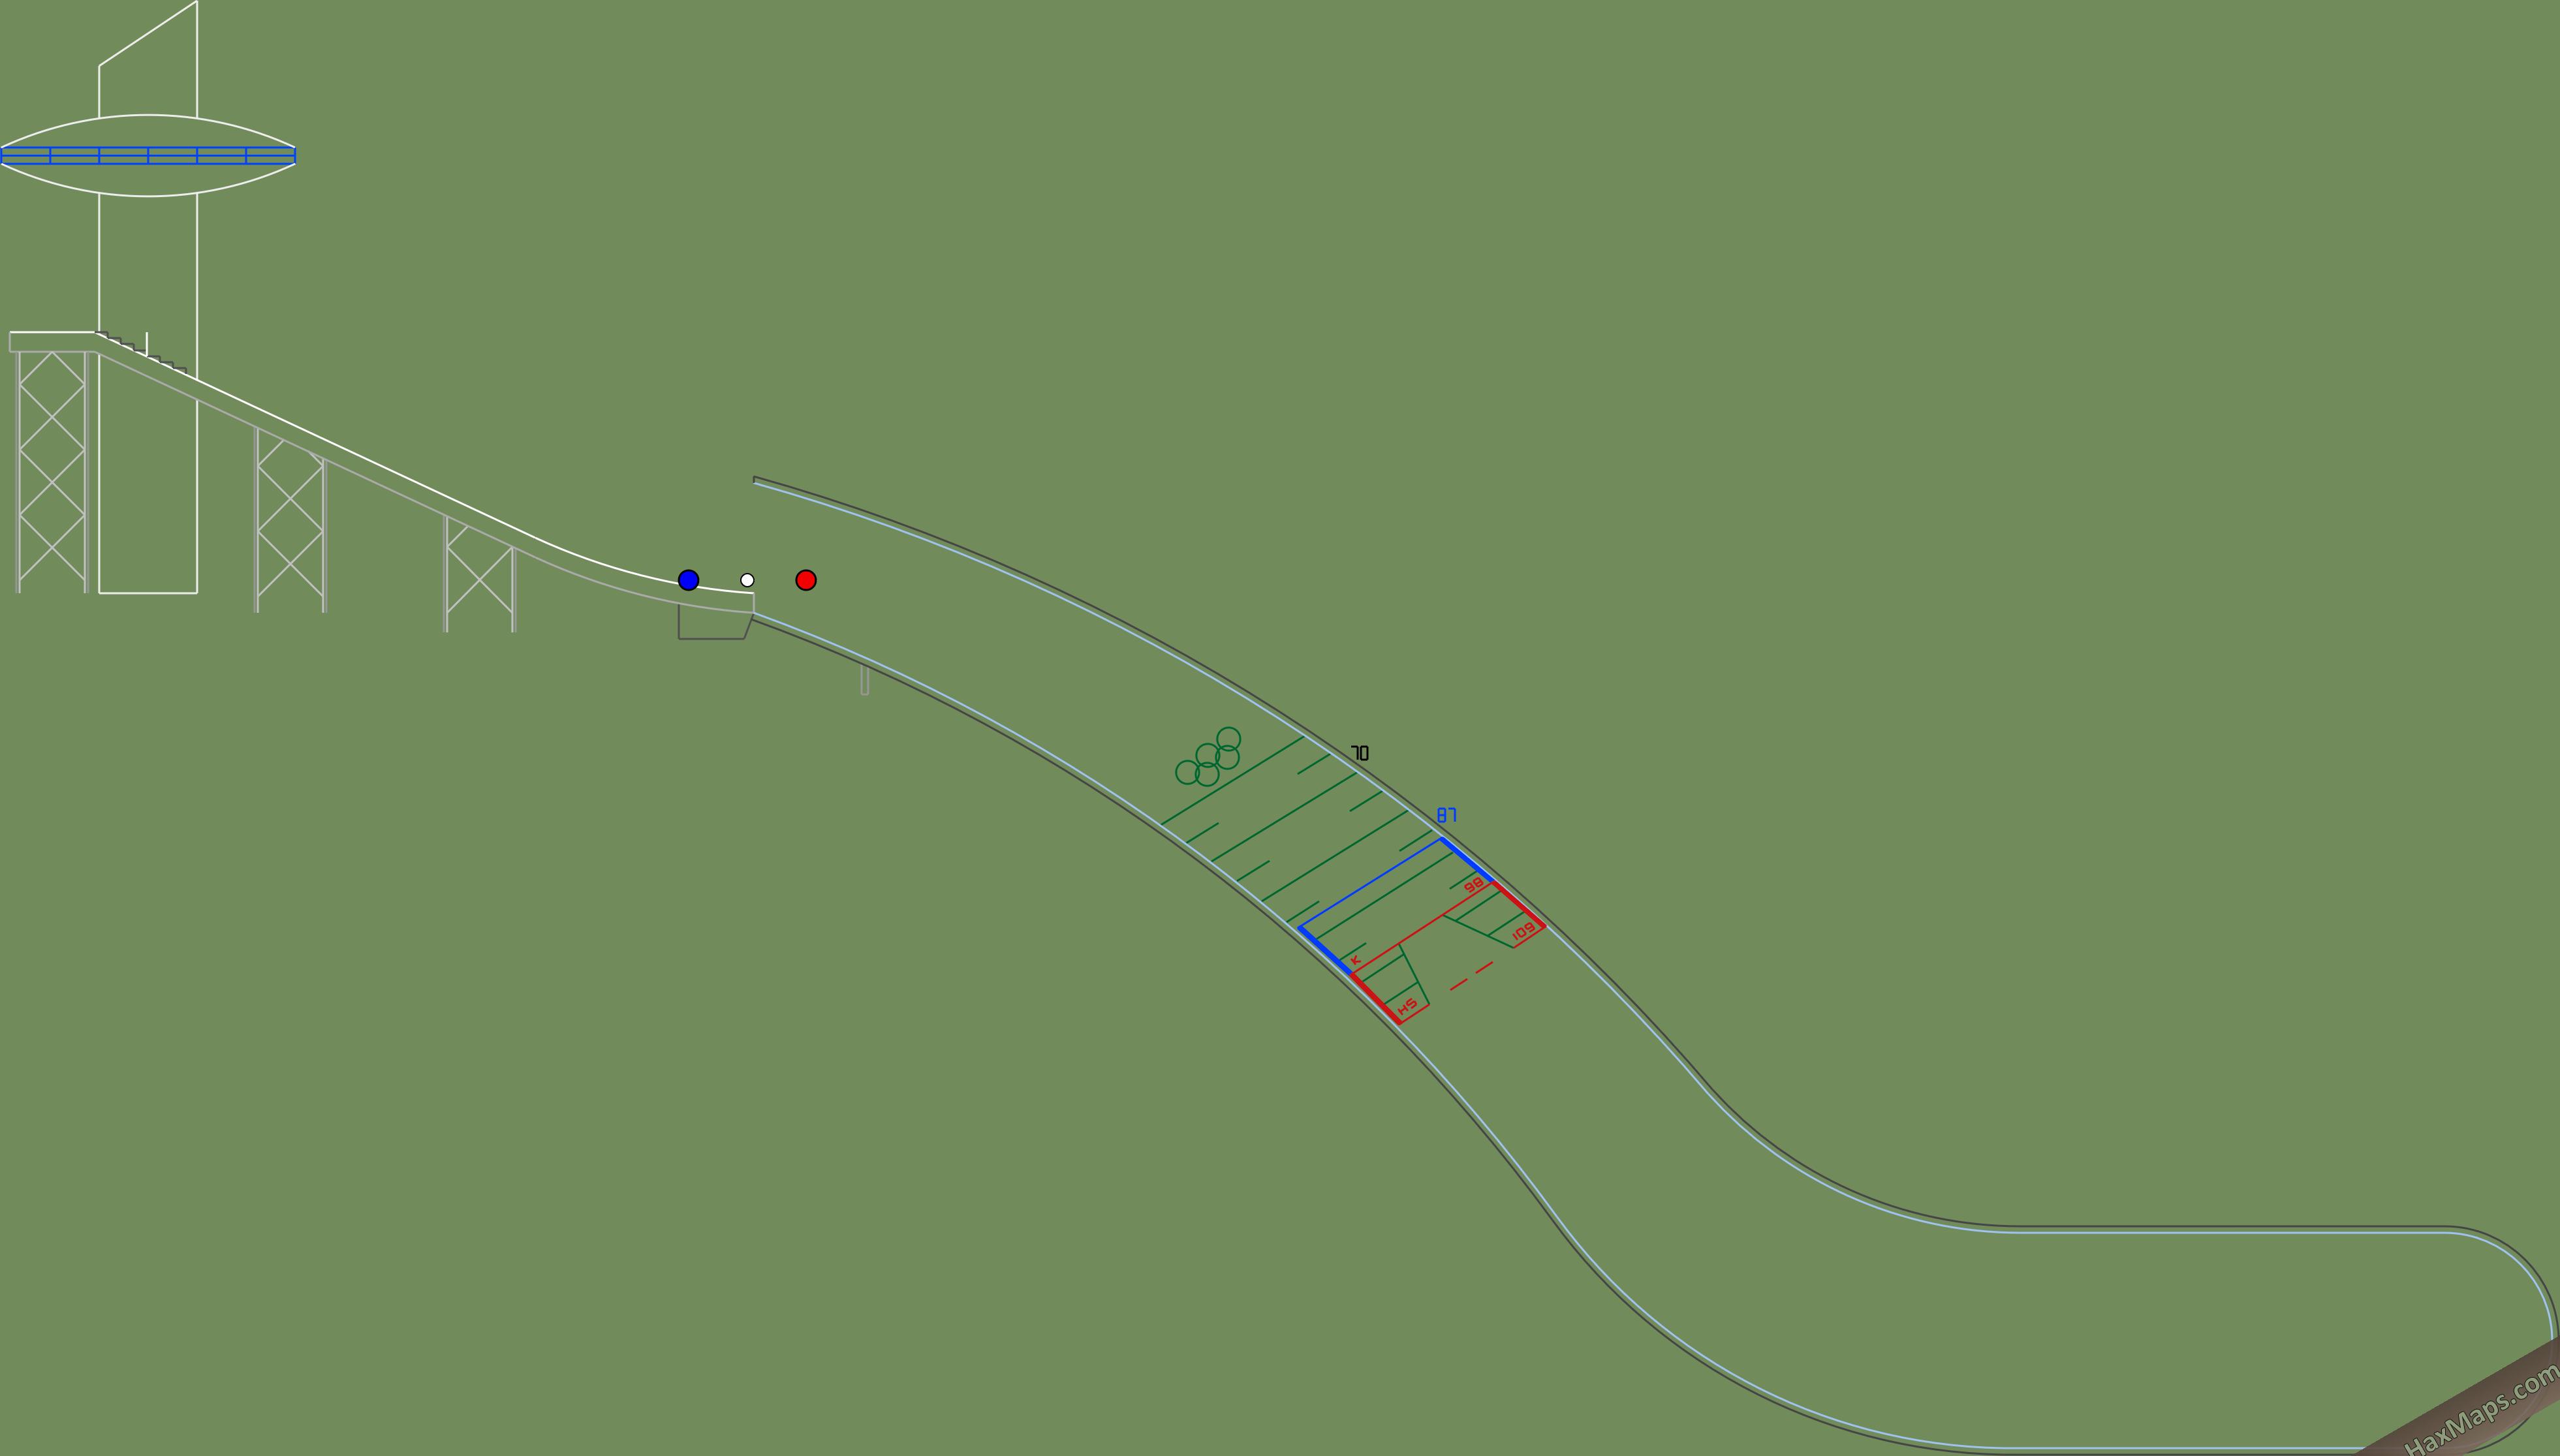 hax ball maps | PyeongChang v2 HS 109 by Wyspy